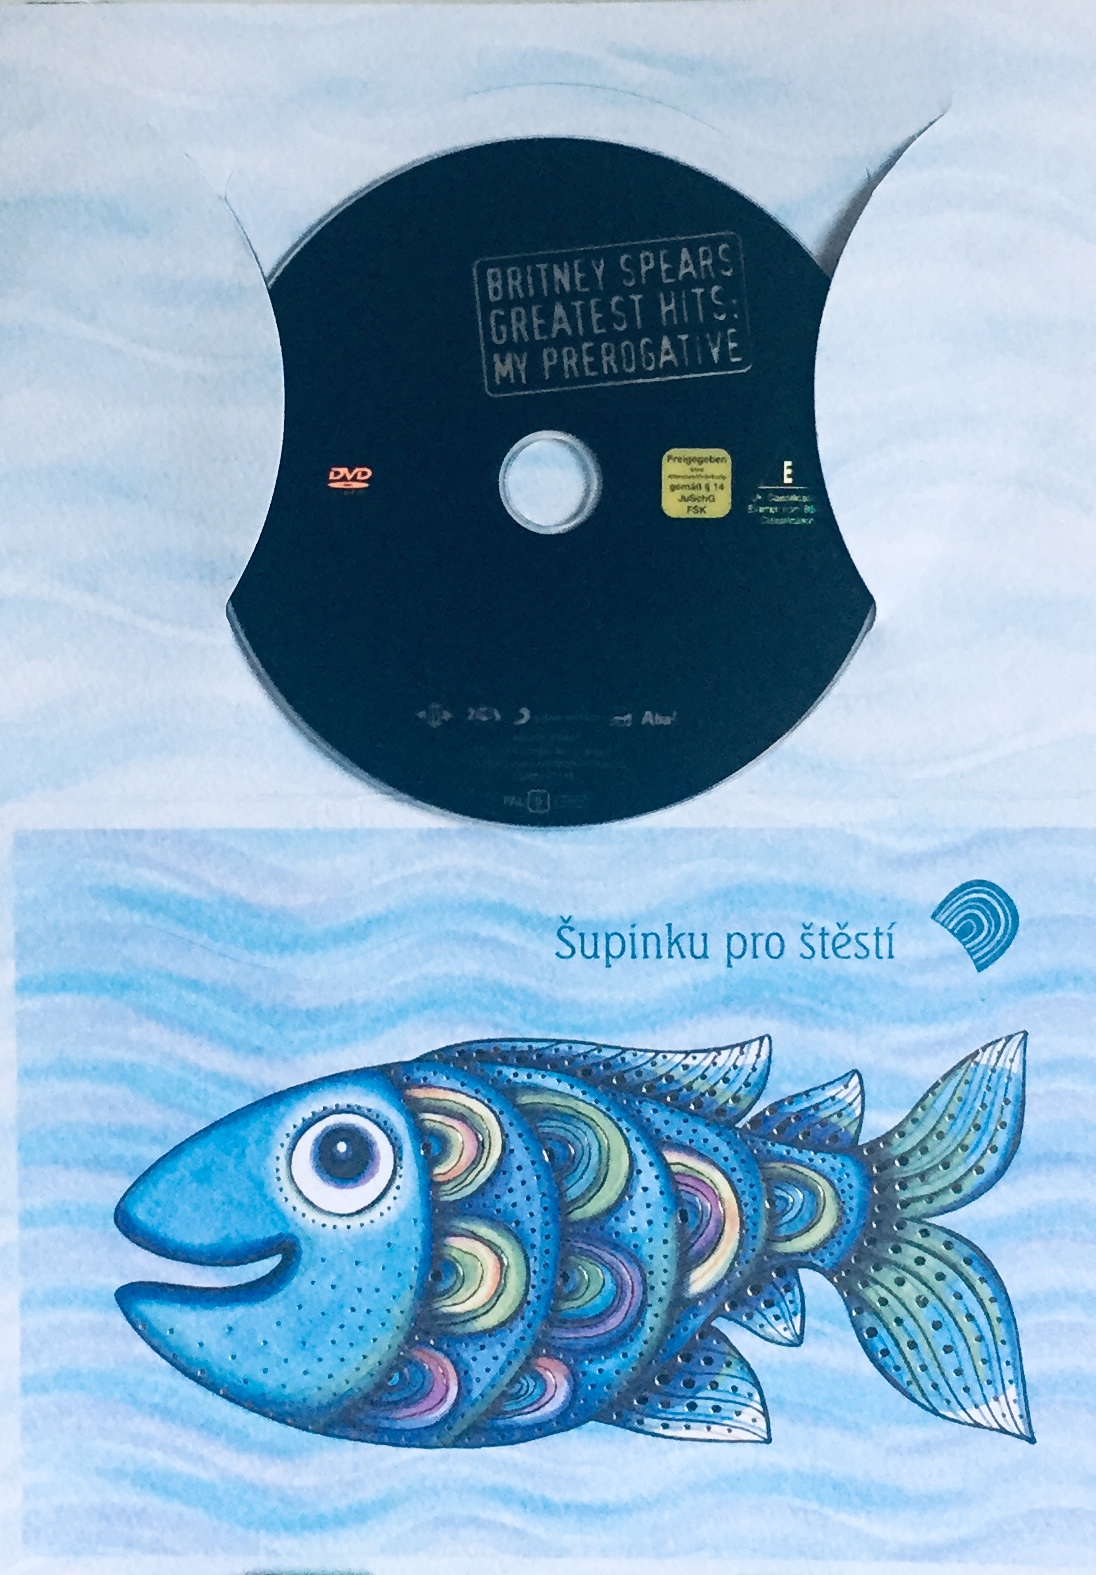 Britney Spears - Greatest Hits: My Prerogative - DVD /dárkový obal/